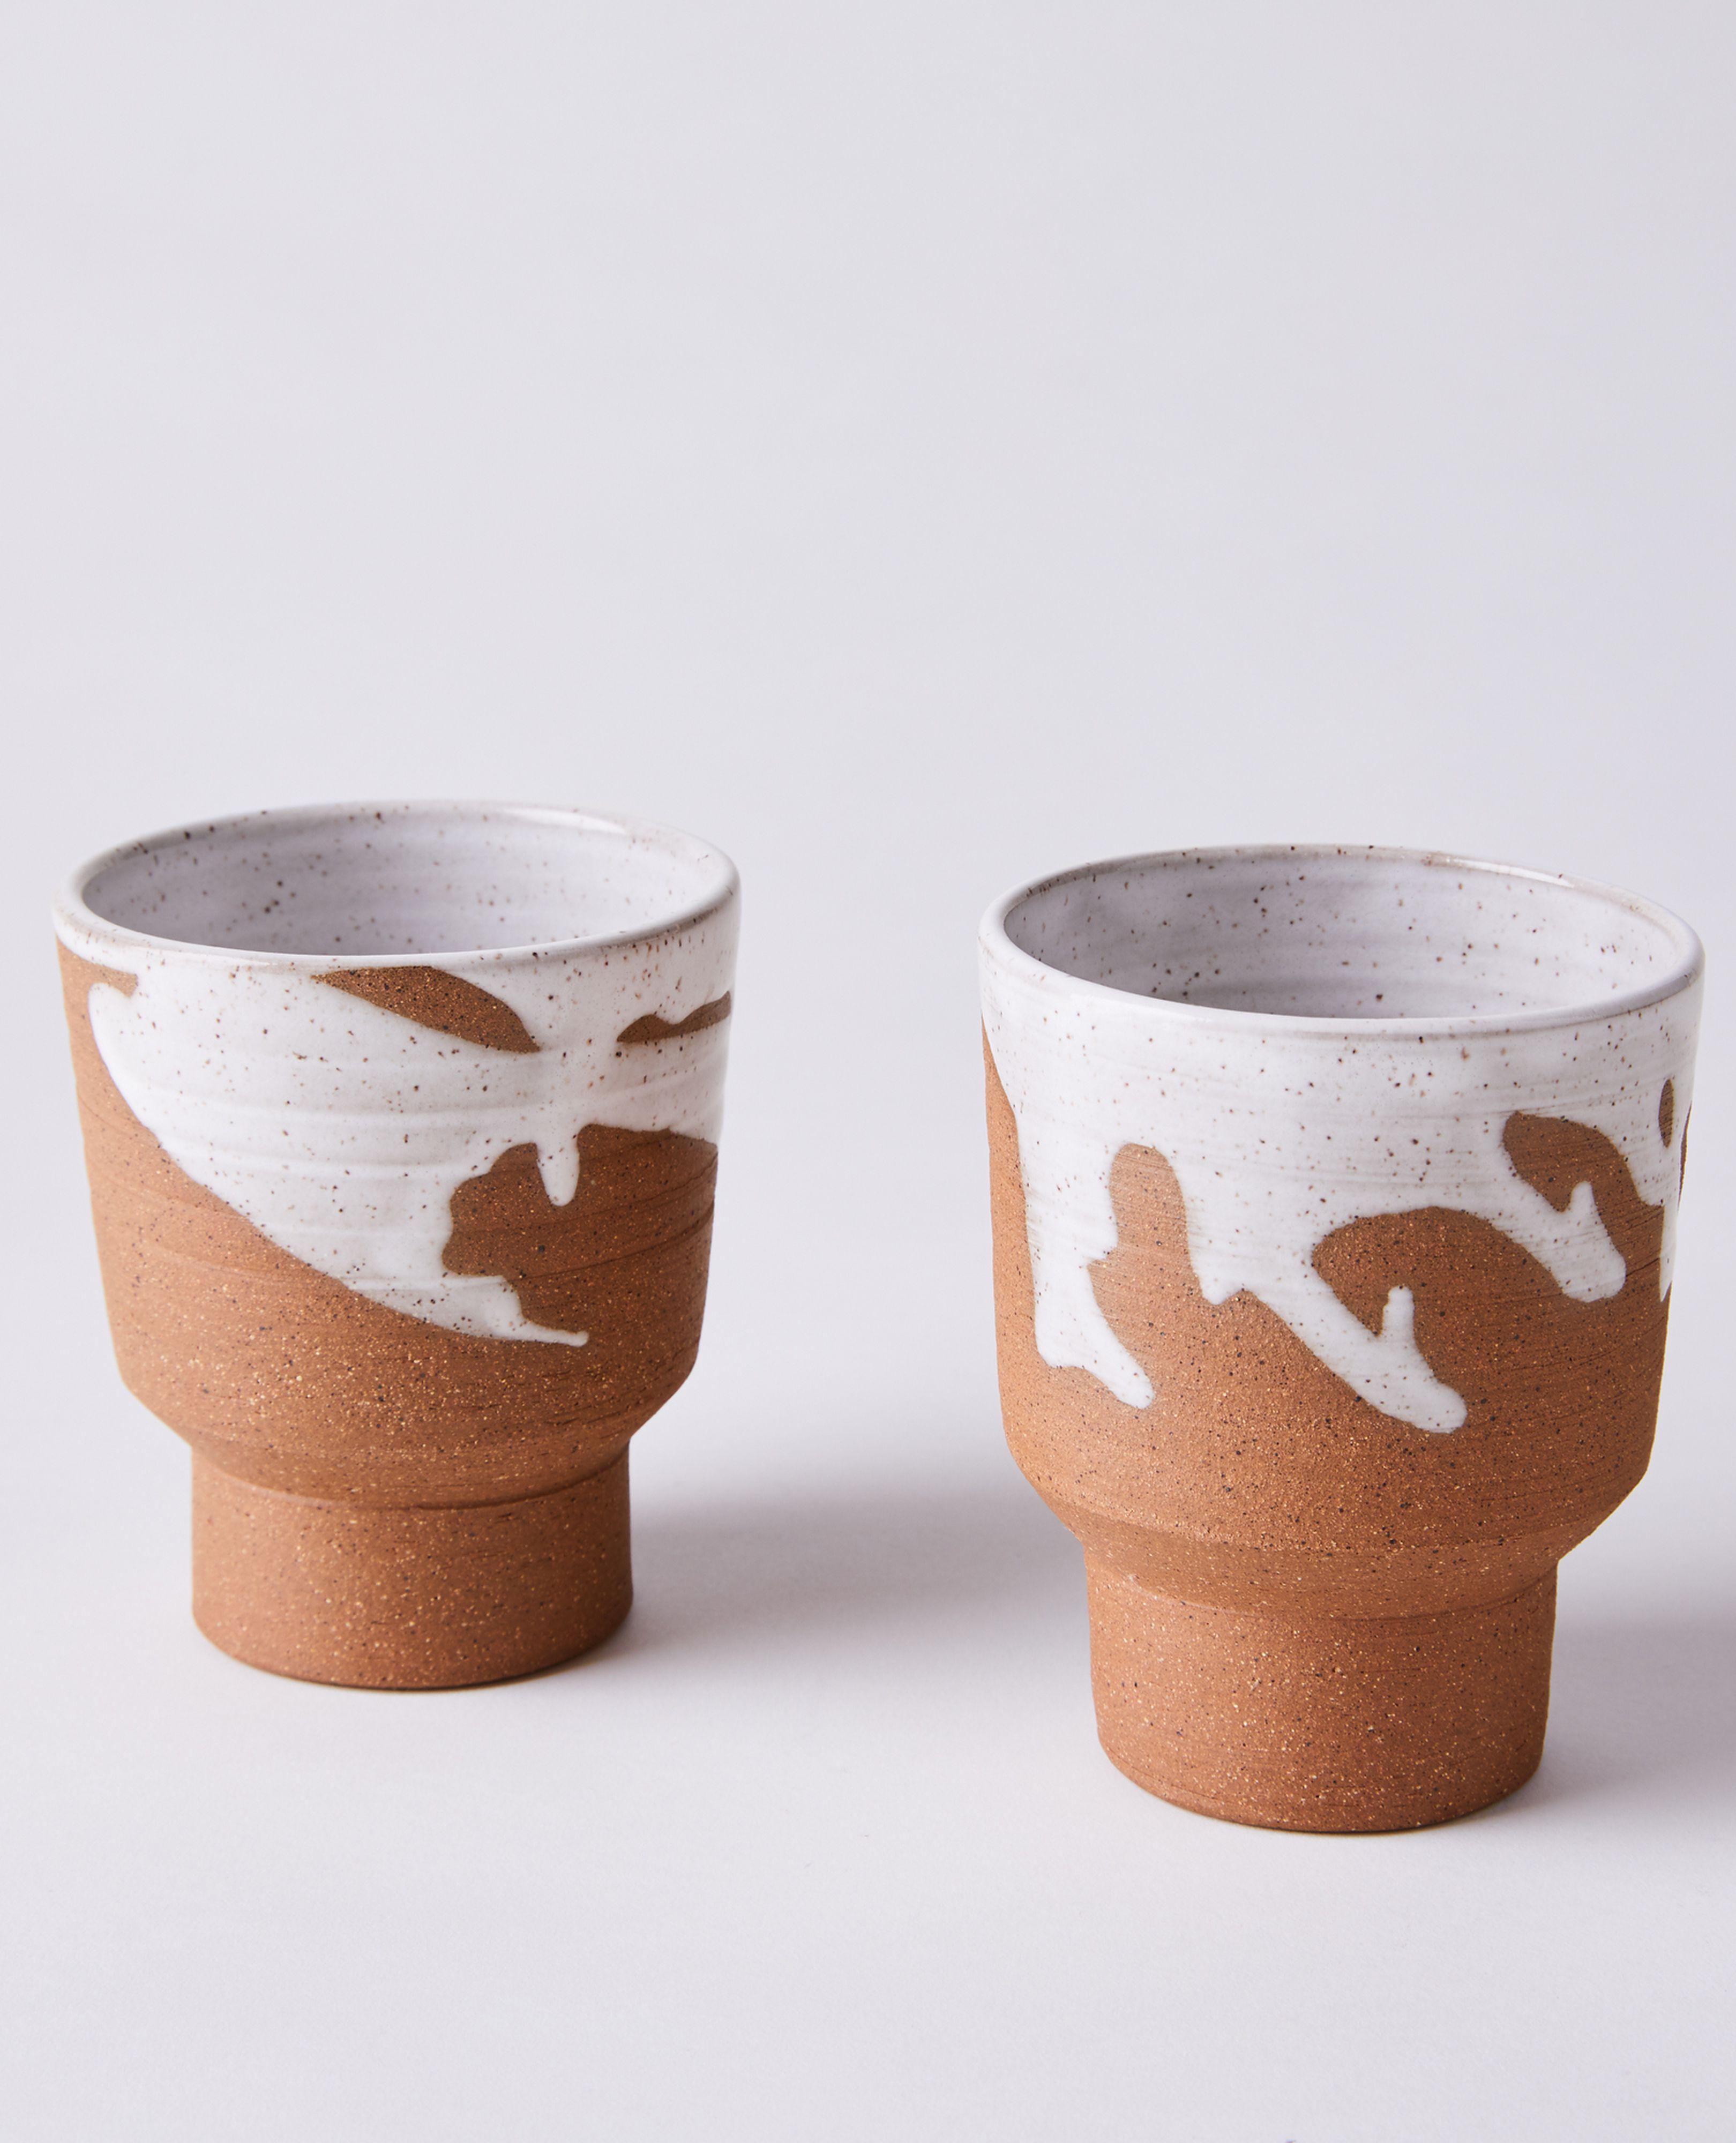 #3 Handmade Stoneware 10oz Mug